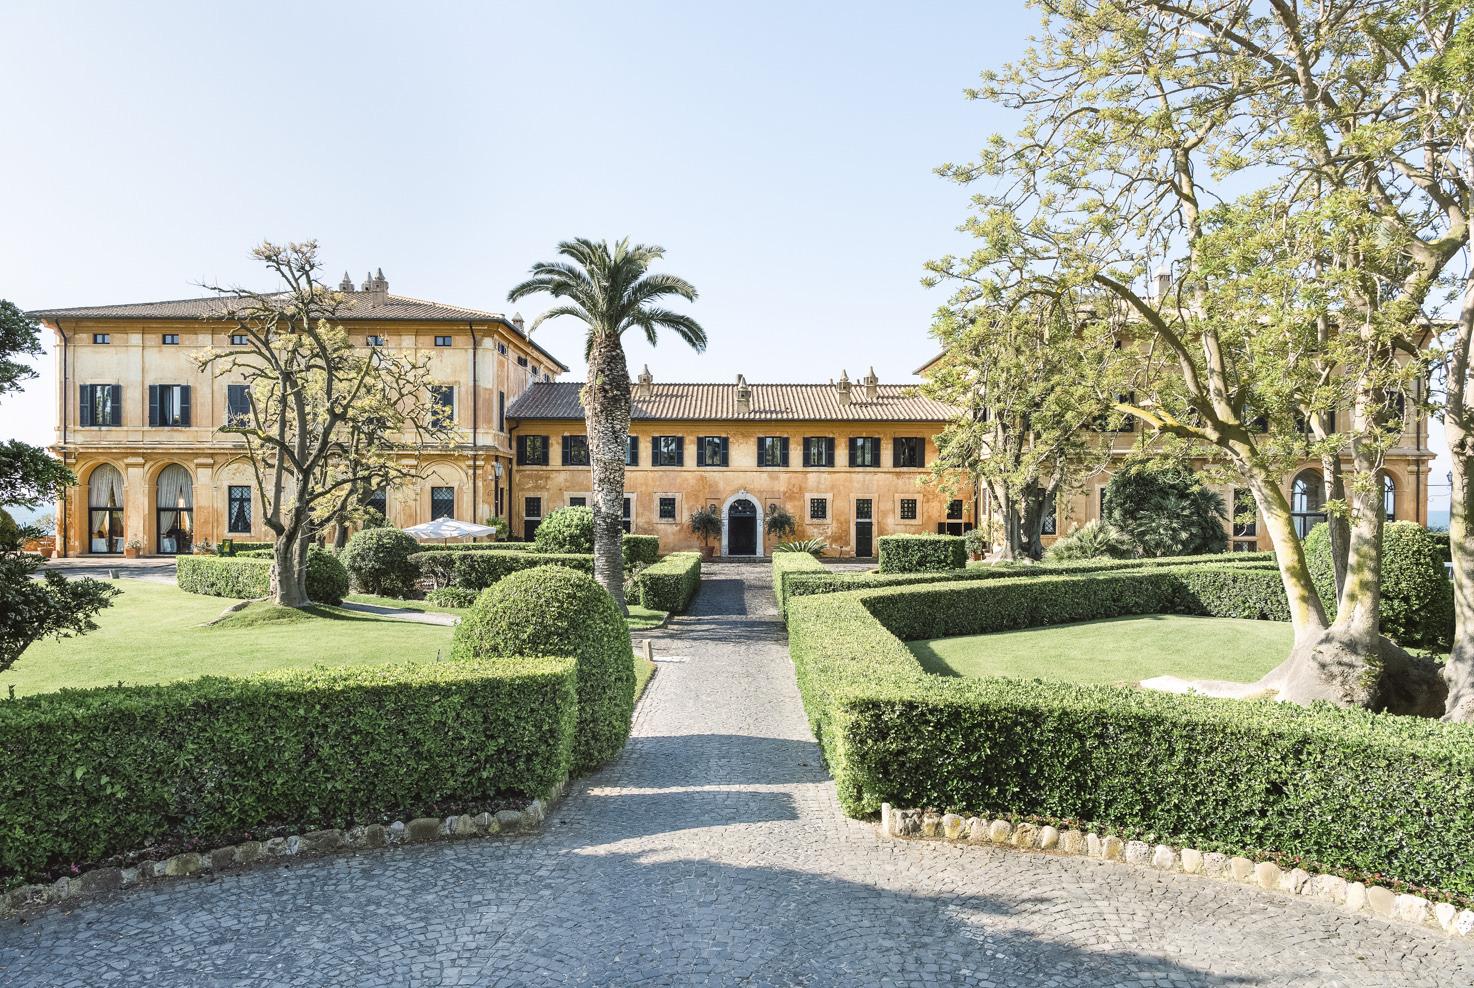 Front view of La Posta Vecchia